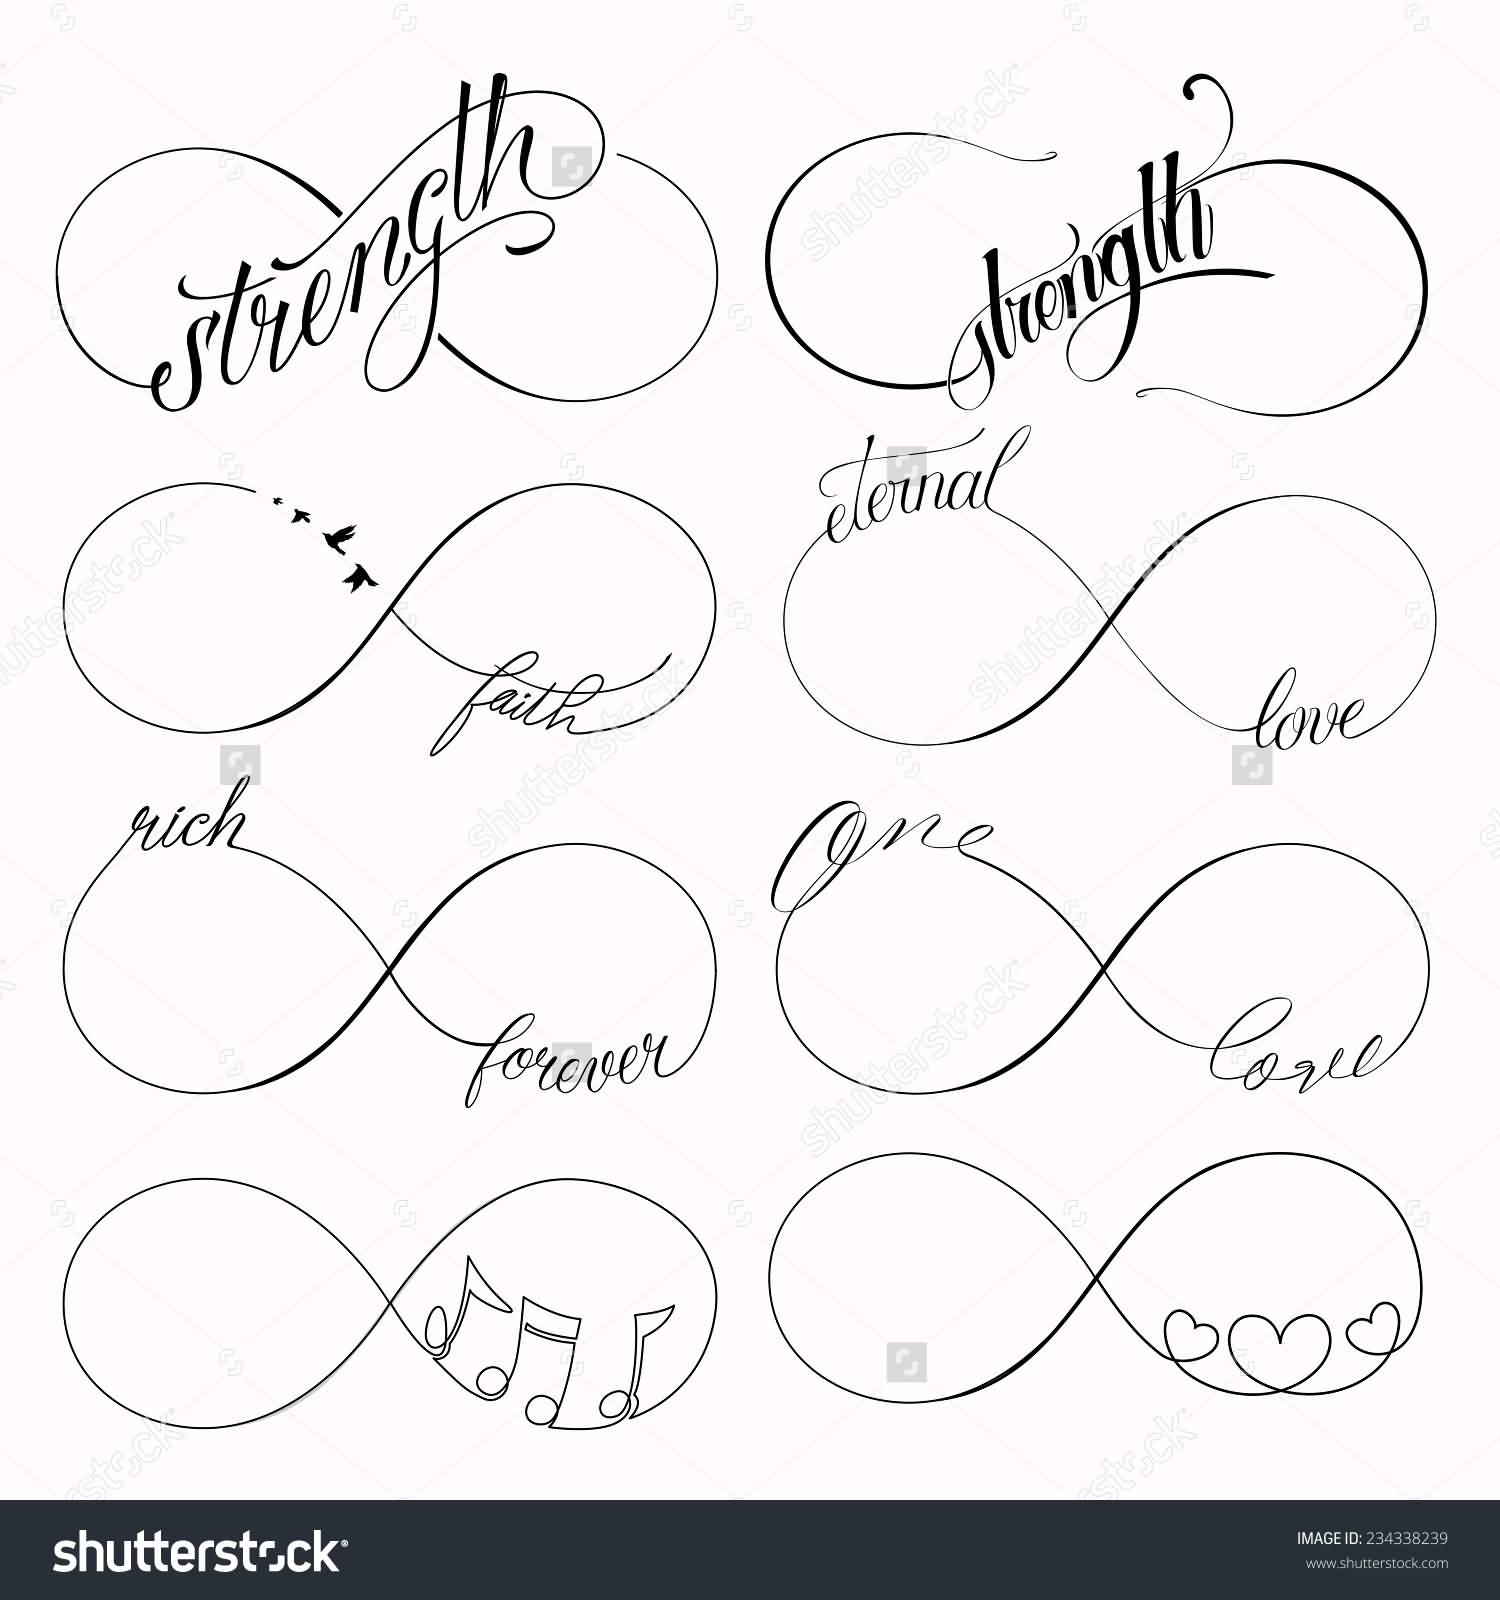 55 infinity symbol tattoo designs popular infinity symbols tattoo design buycottarizona Choice Image